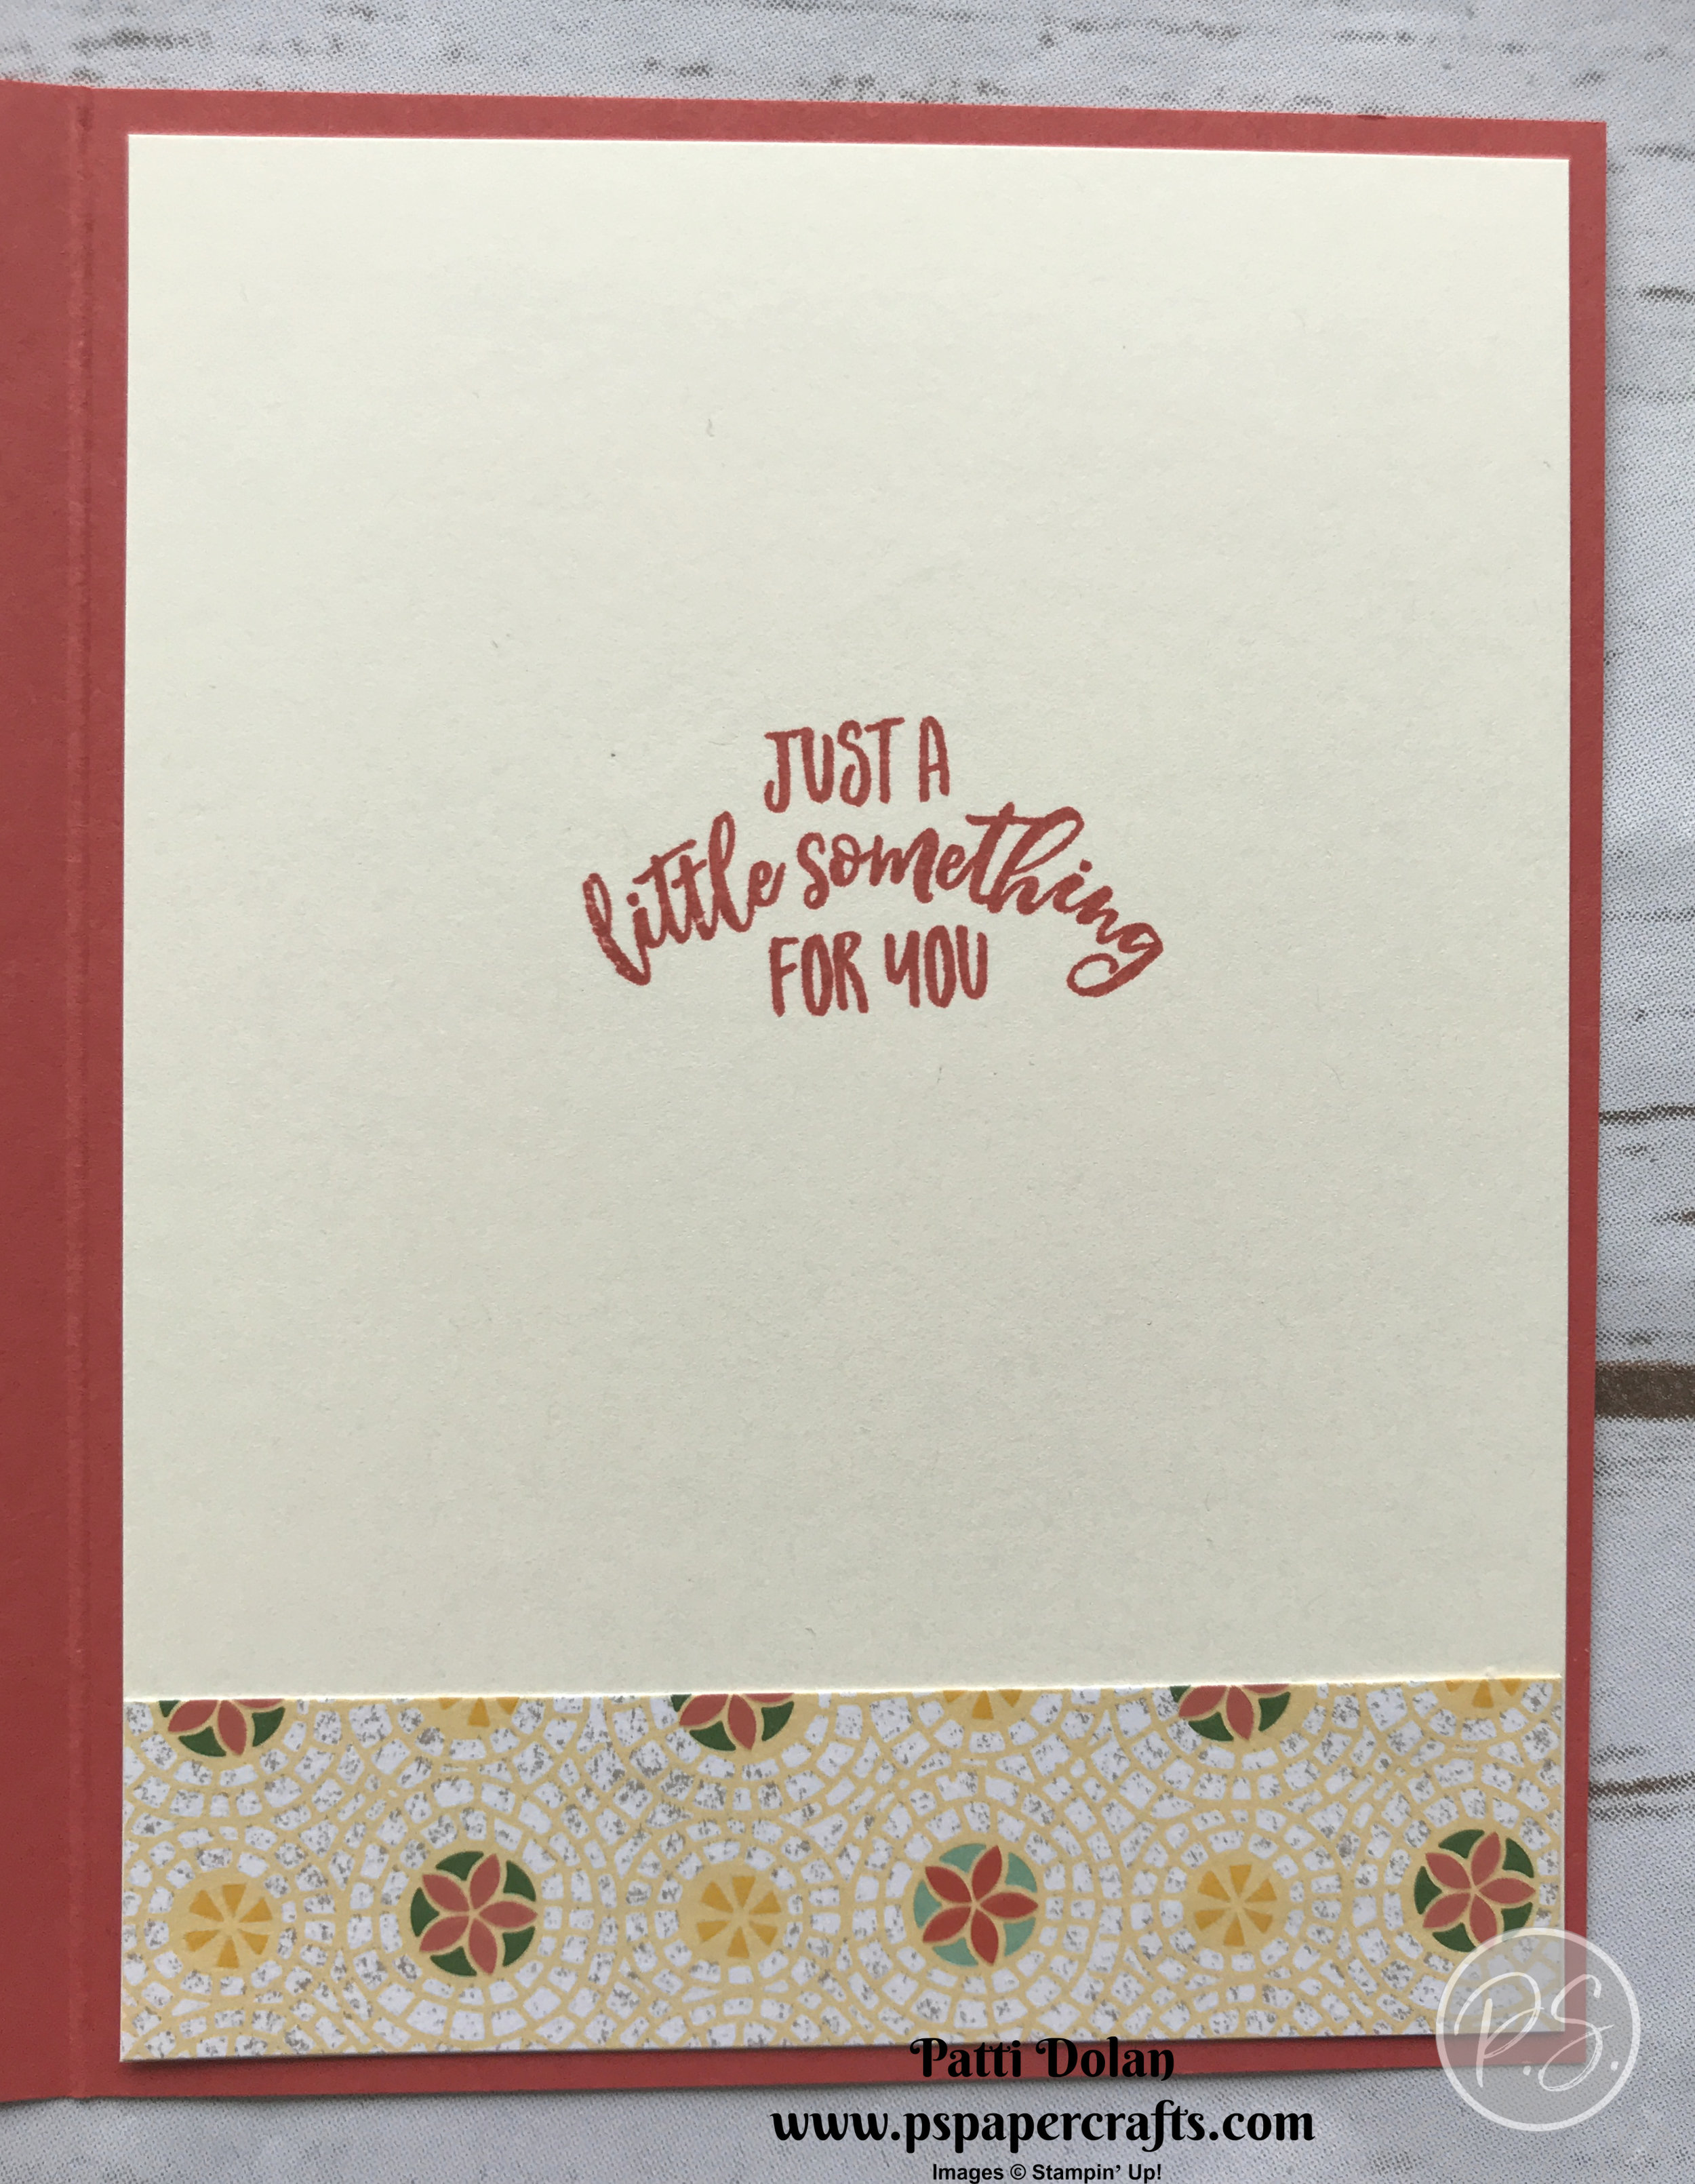 Delightful Day Birthday Card Inside.jpg